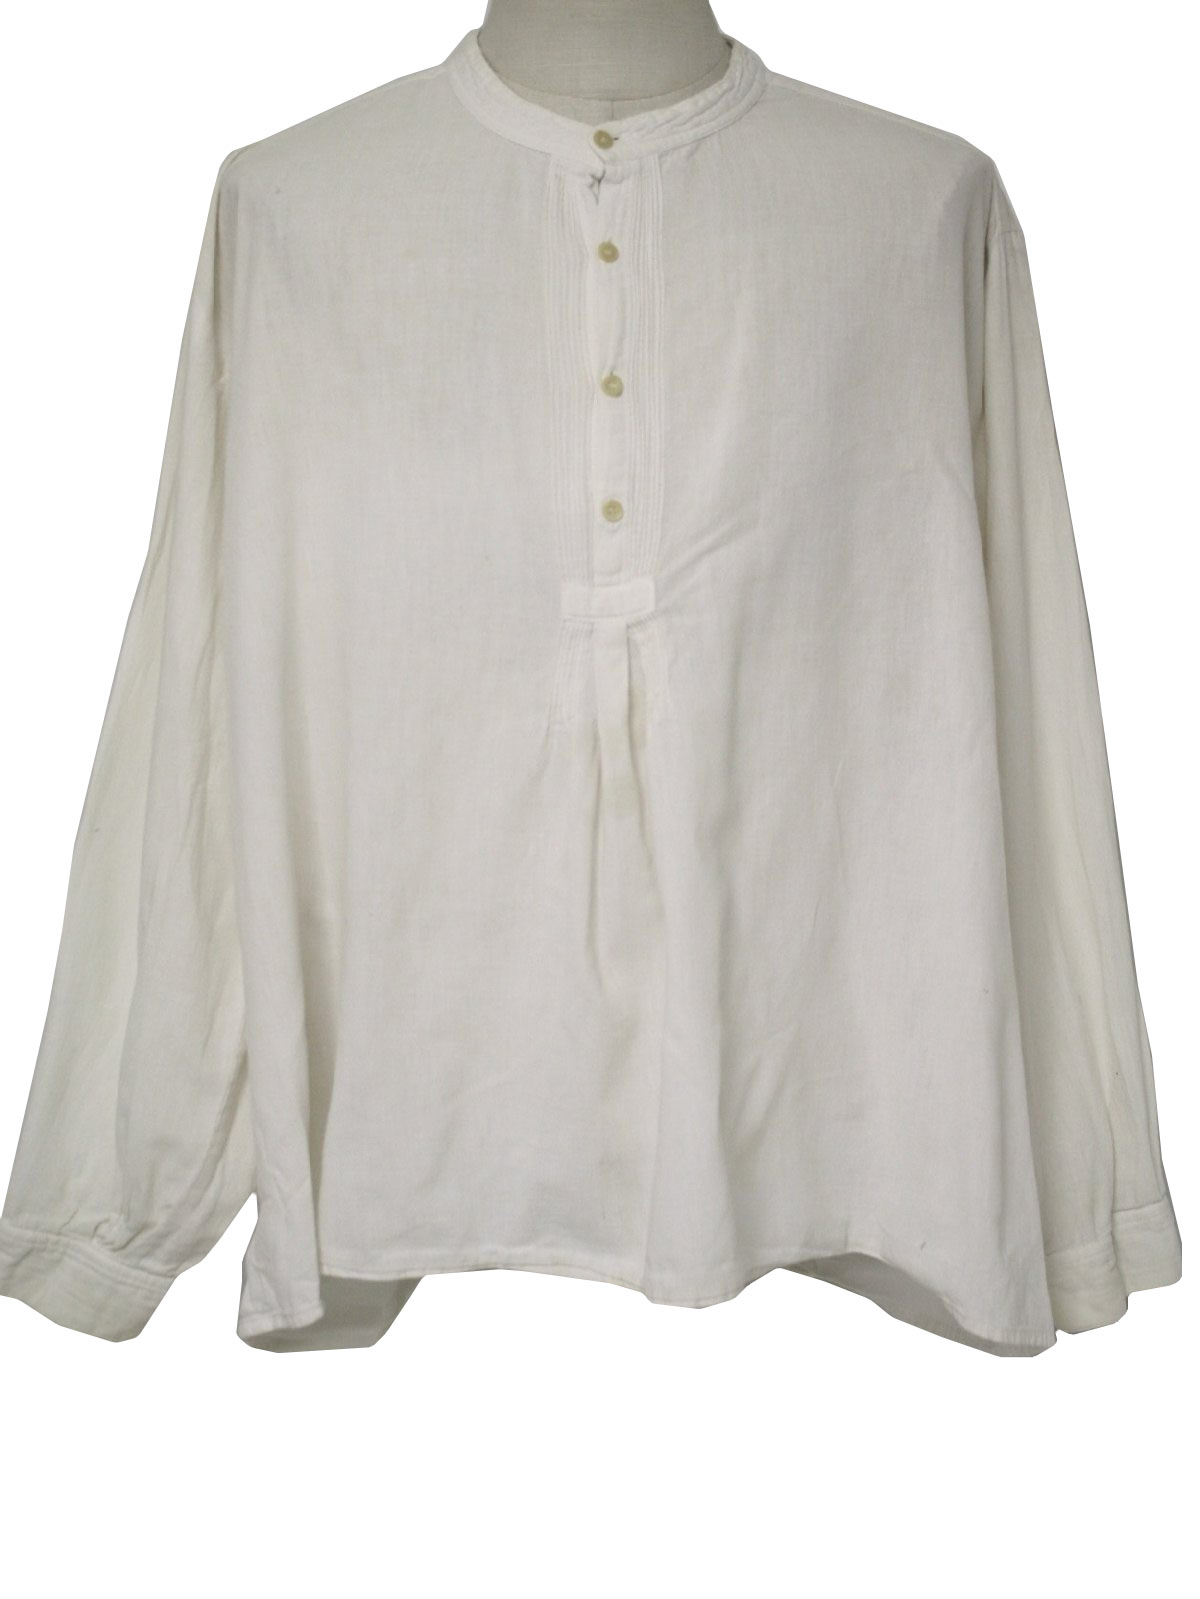 Retro Seventies Hippie Shirt 70s Orchid Lane Mens Off